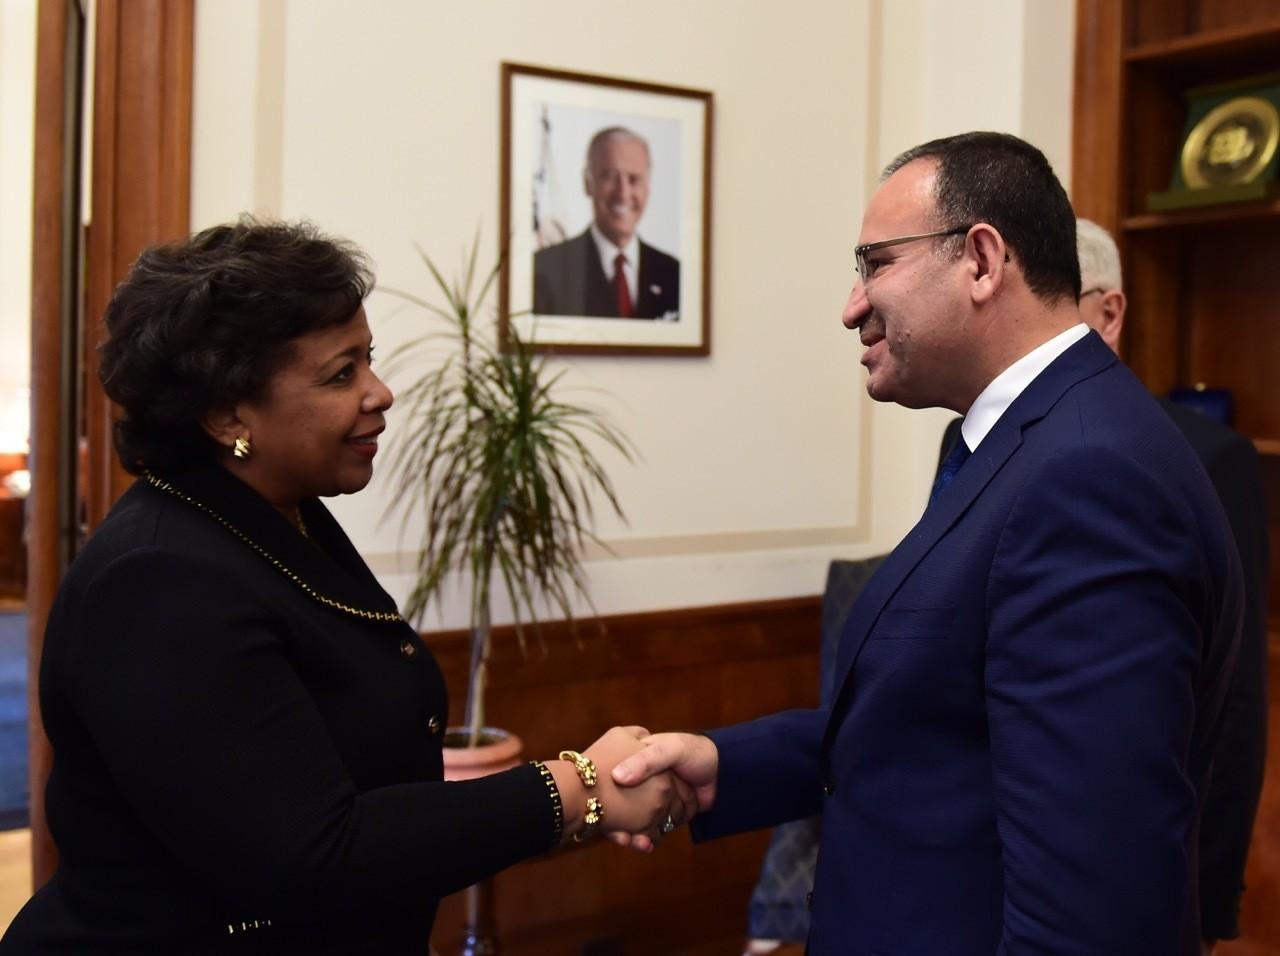 Justice Minister Bekir Bozdau011f (R) with his U.S. counterpart Attorney General Loretta Lynch